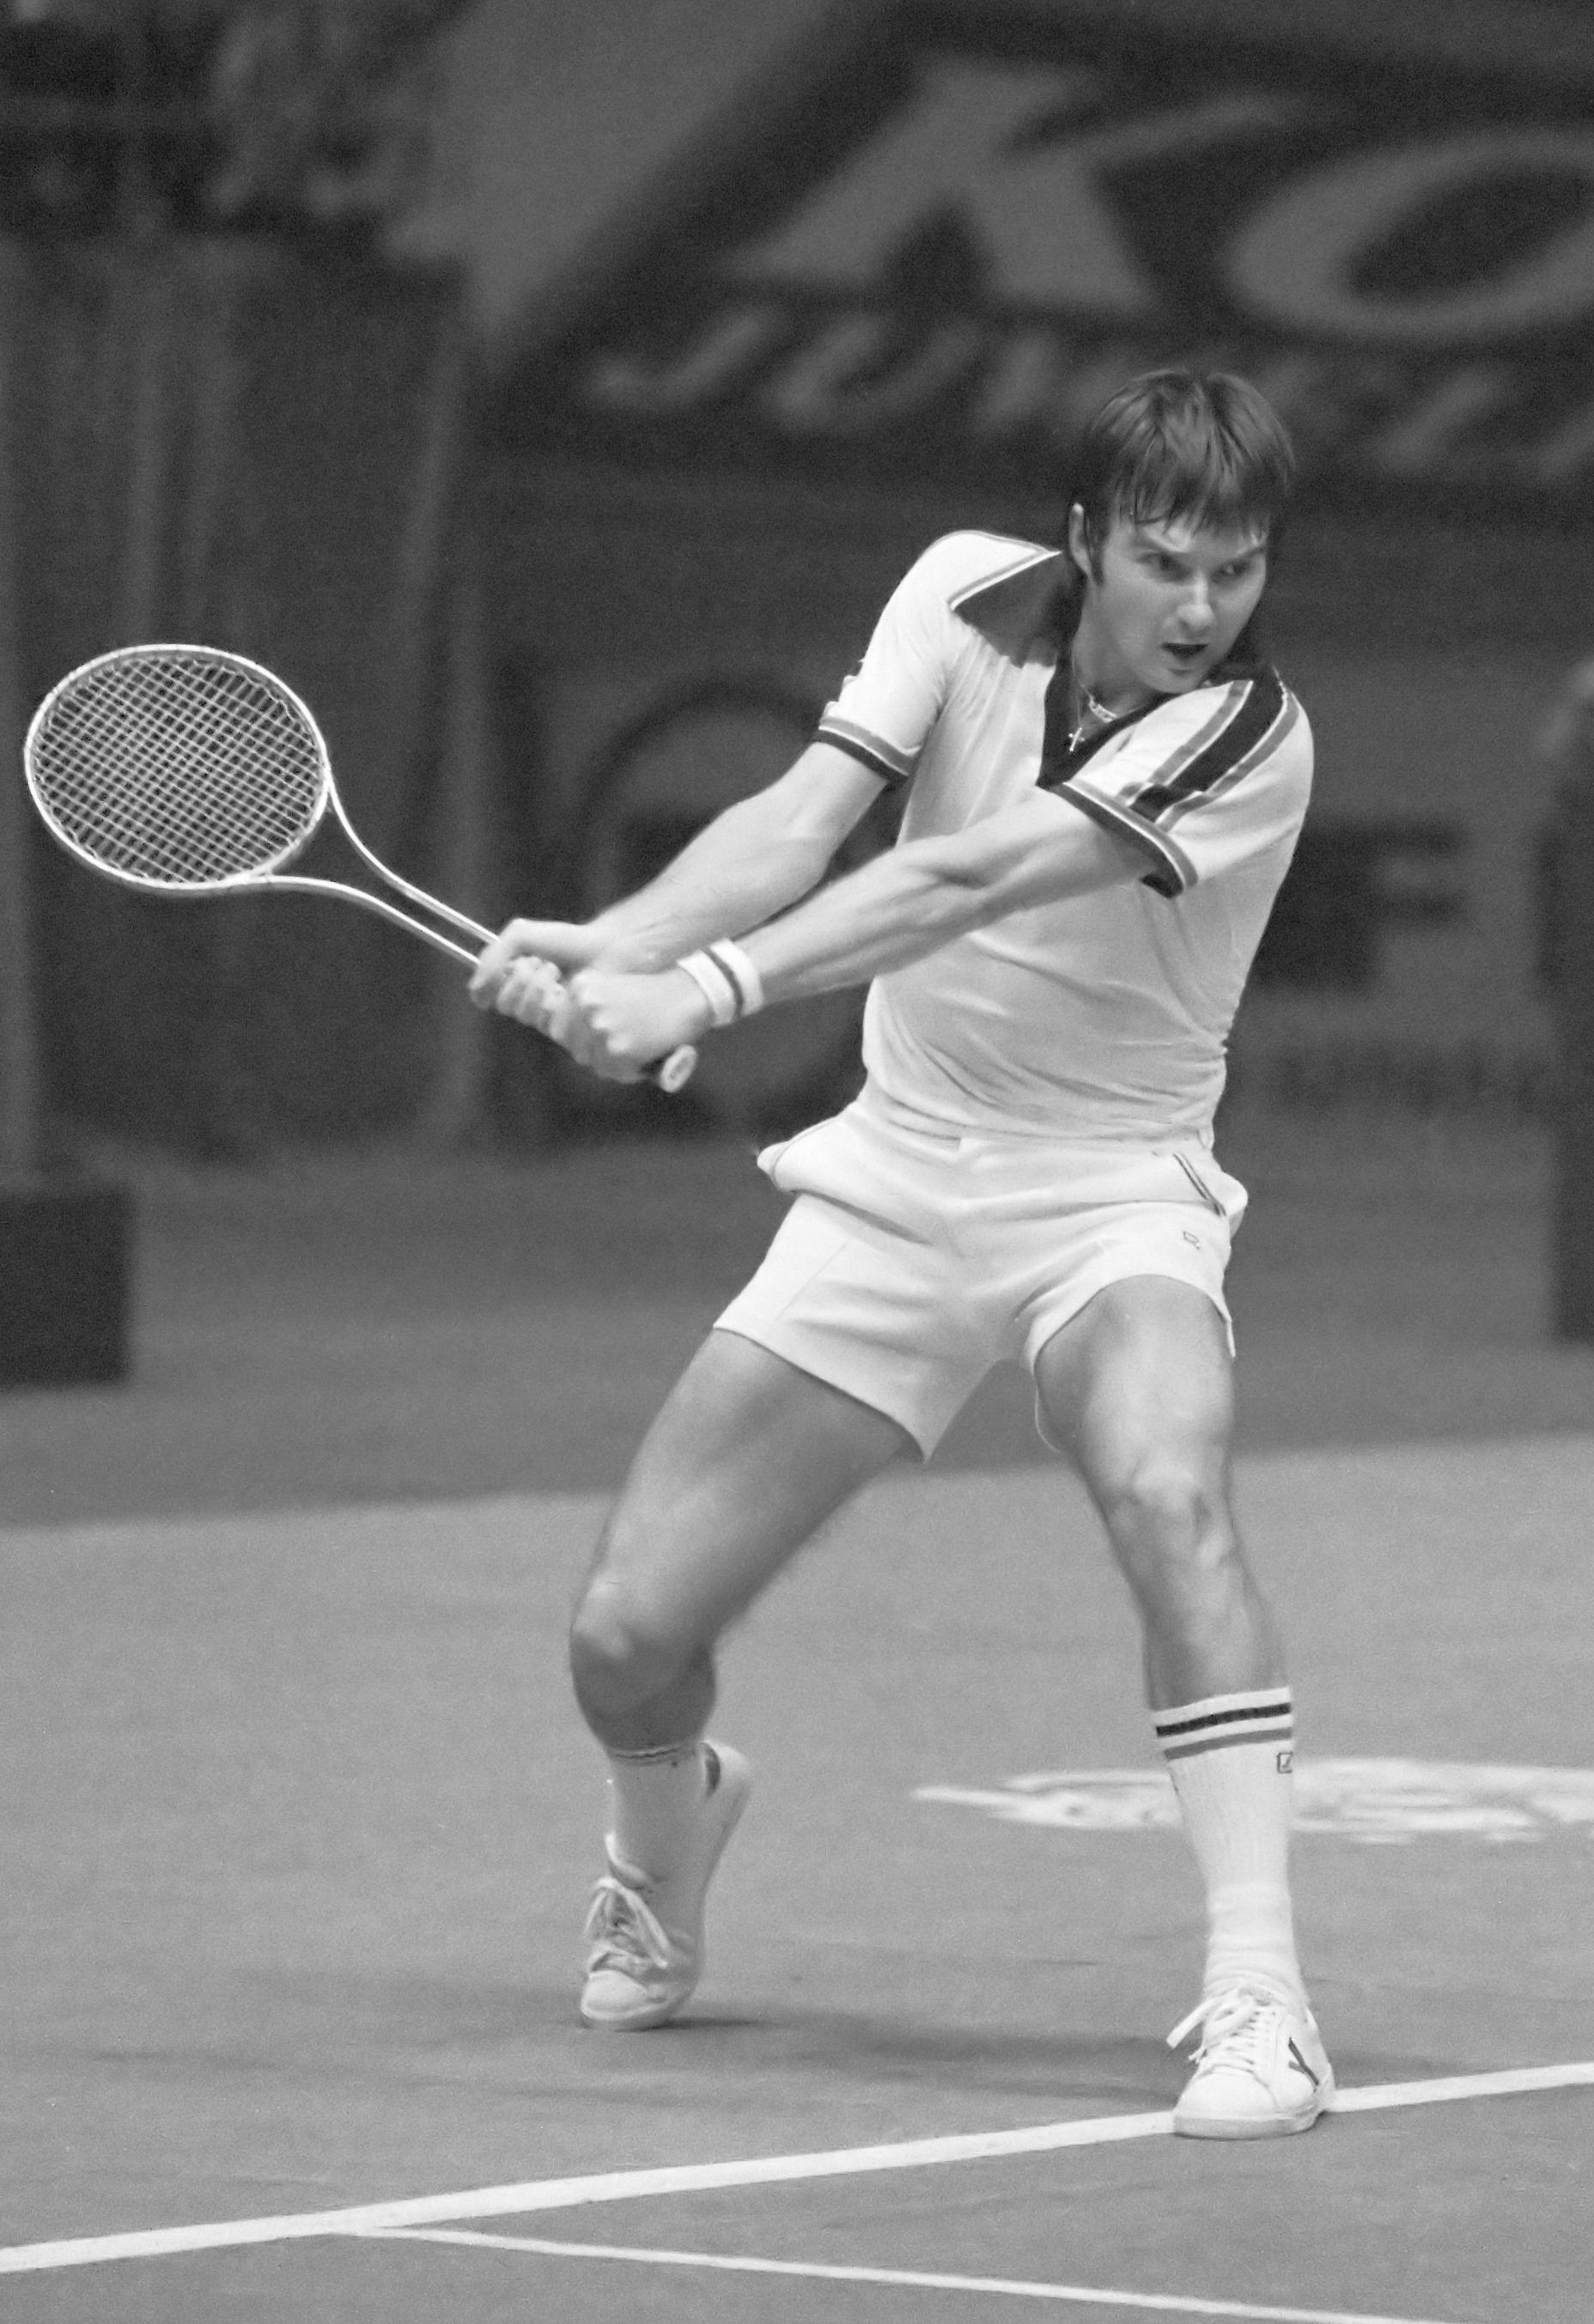 1982 Grand Prix Tennis Wikipedia Congrats to @ricelake on winning for your sponsorship debut!! https en wikipedia org wiki 1982 grand prix tennis